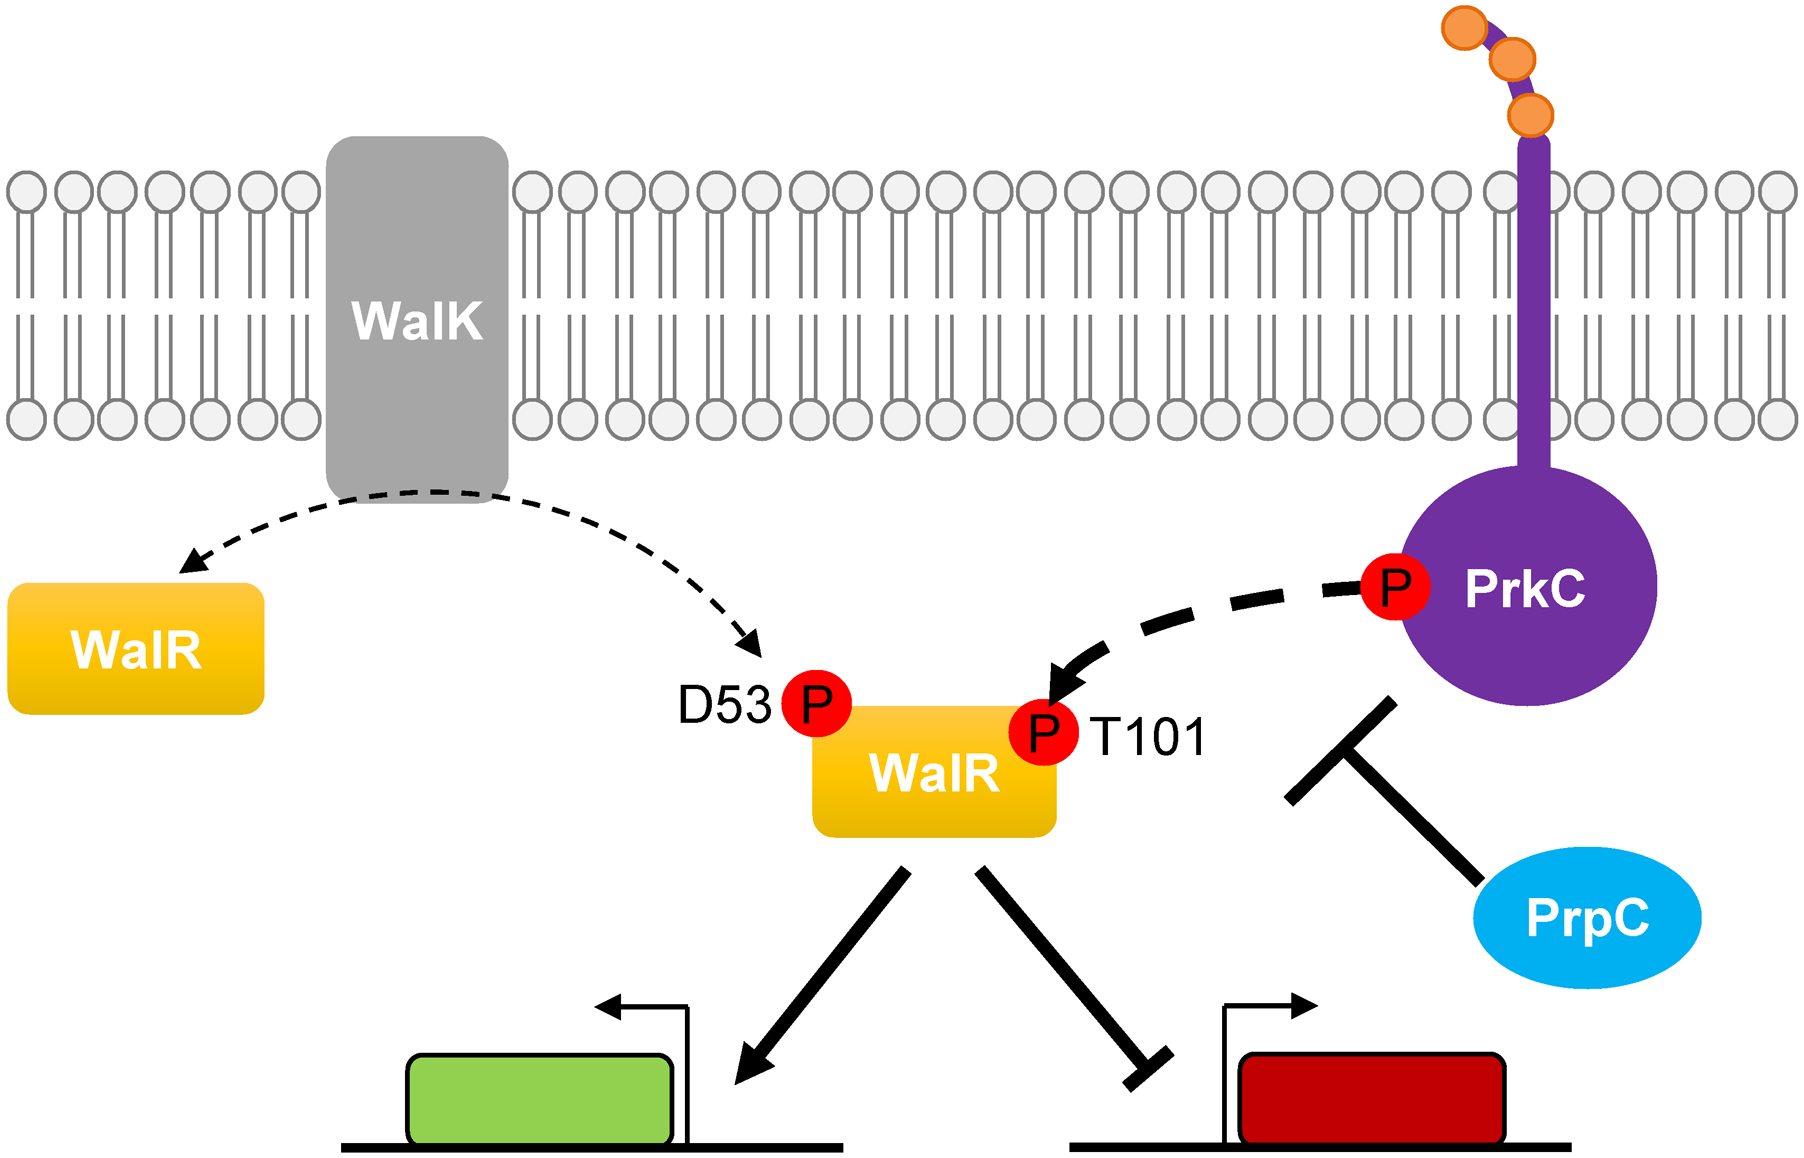 Model of PrkC dependent WalR phosphorylation.